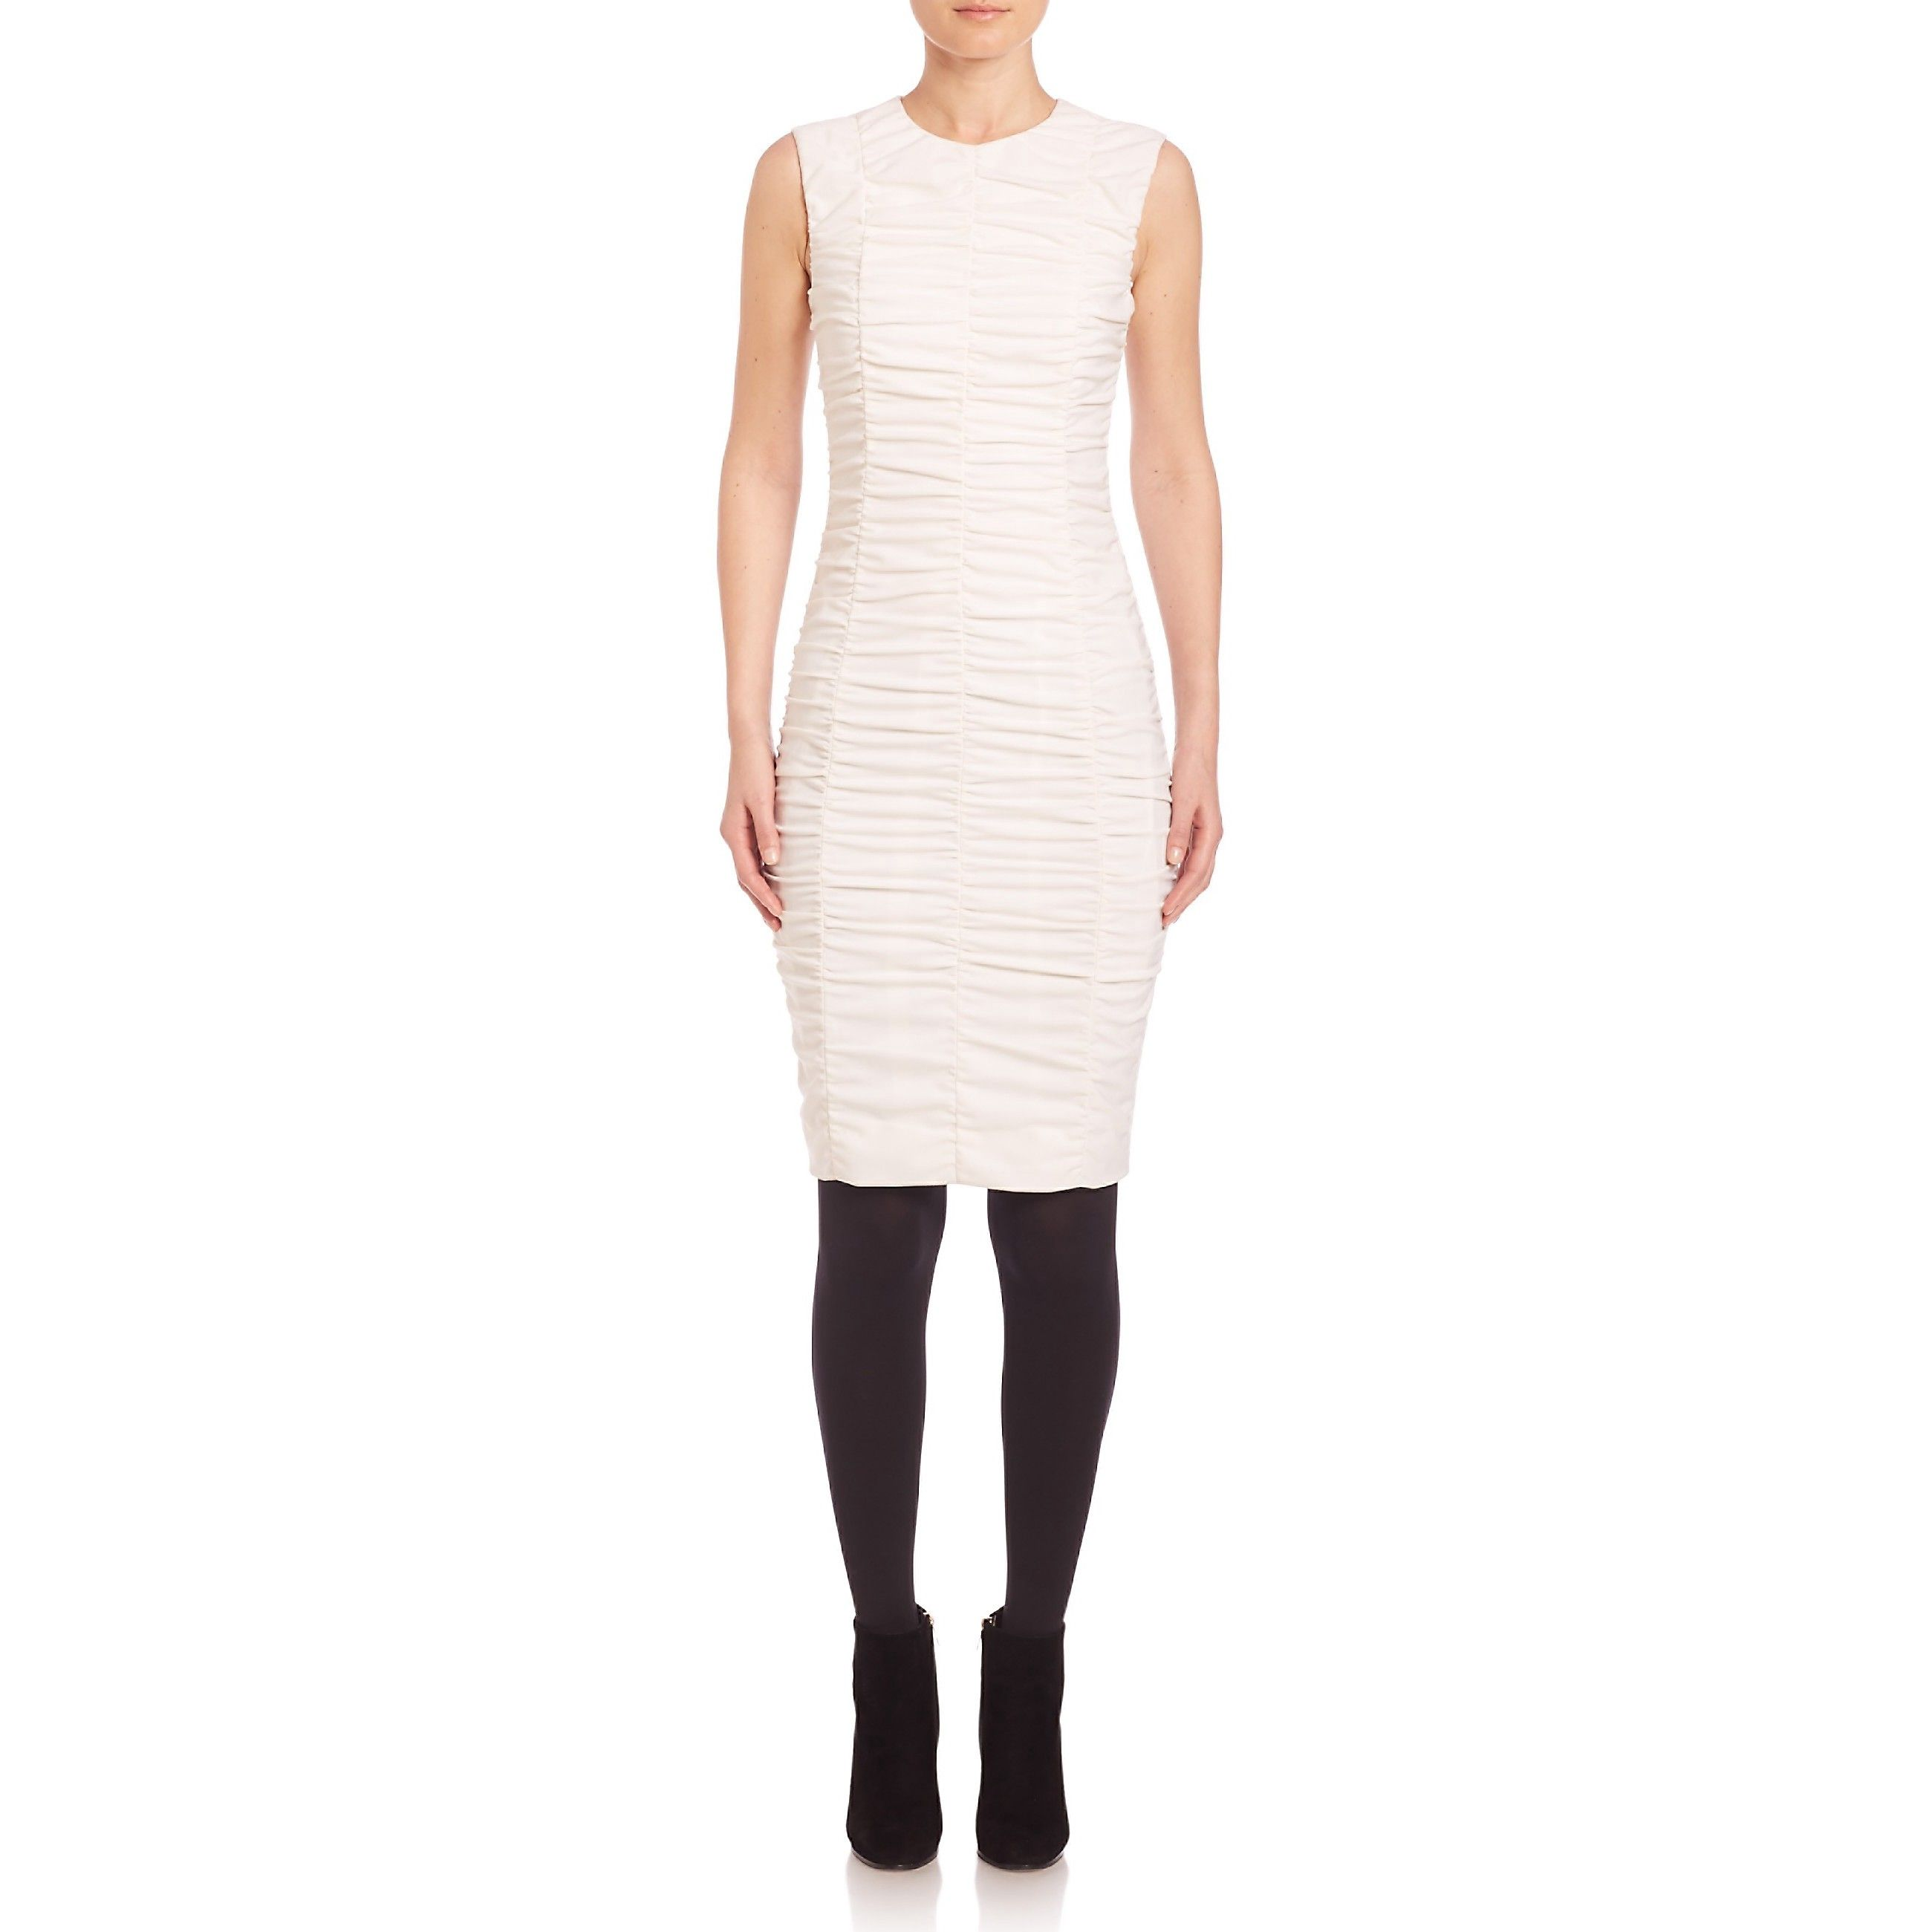 0d4816e84f81d7 AKRIS PUNTO Sleeveless Ruched-Front Dress.  akrispunto  cloth